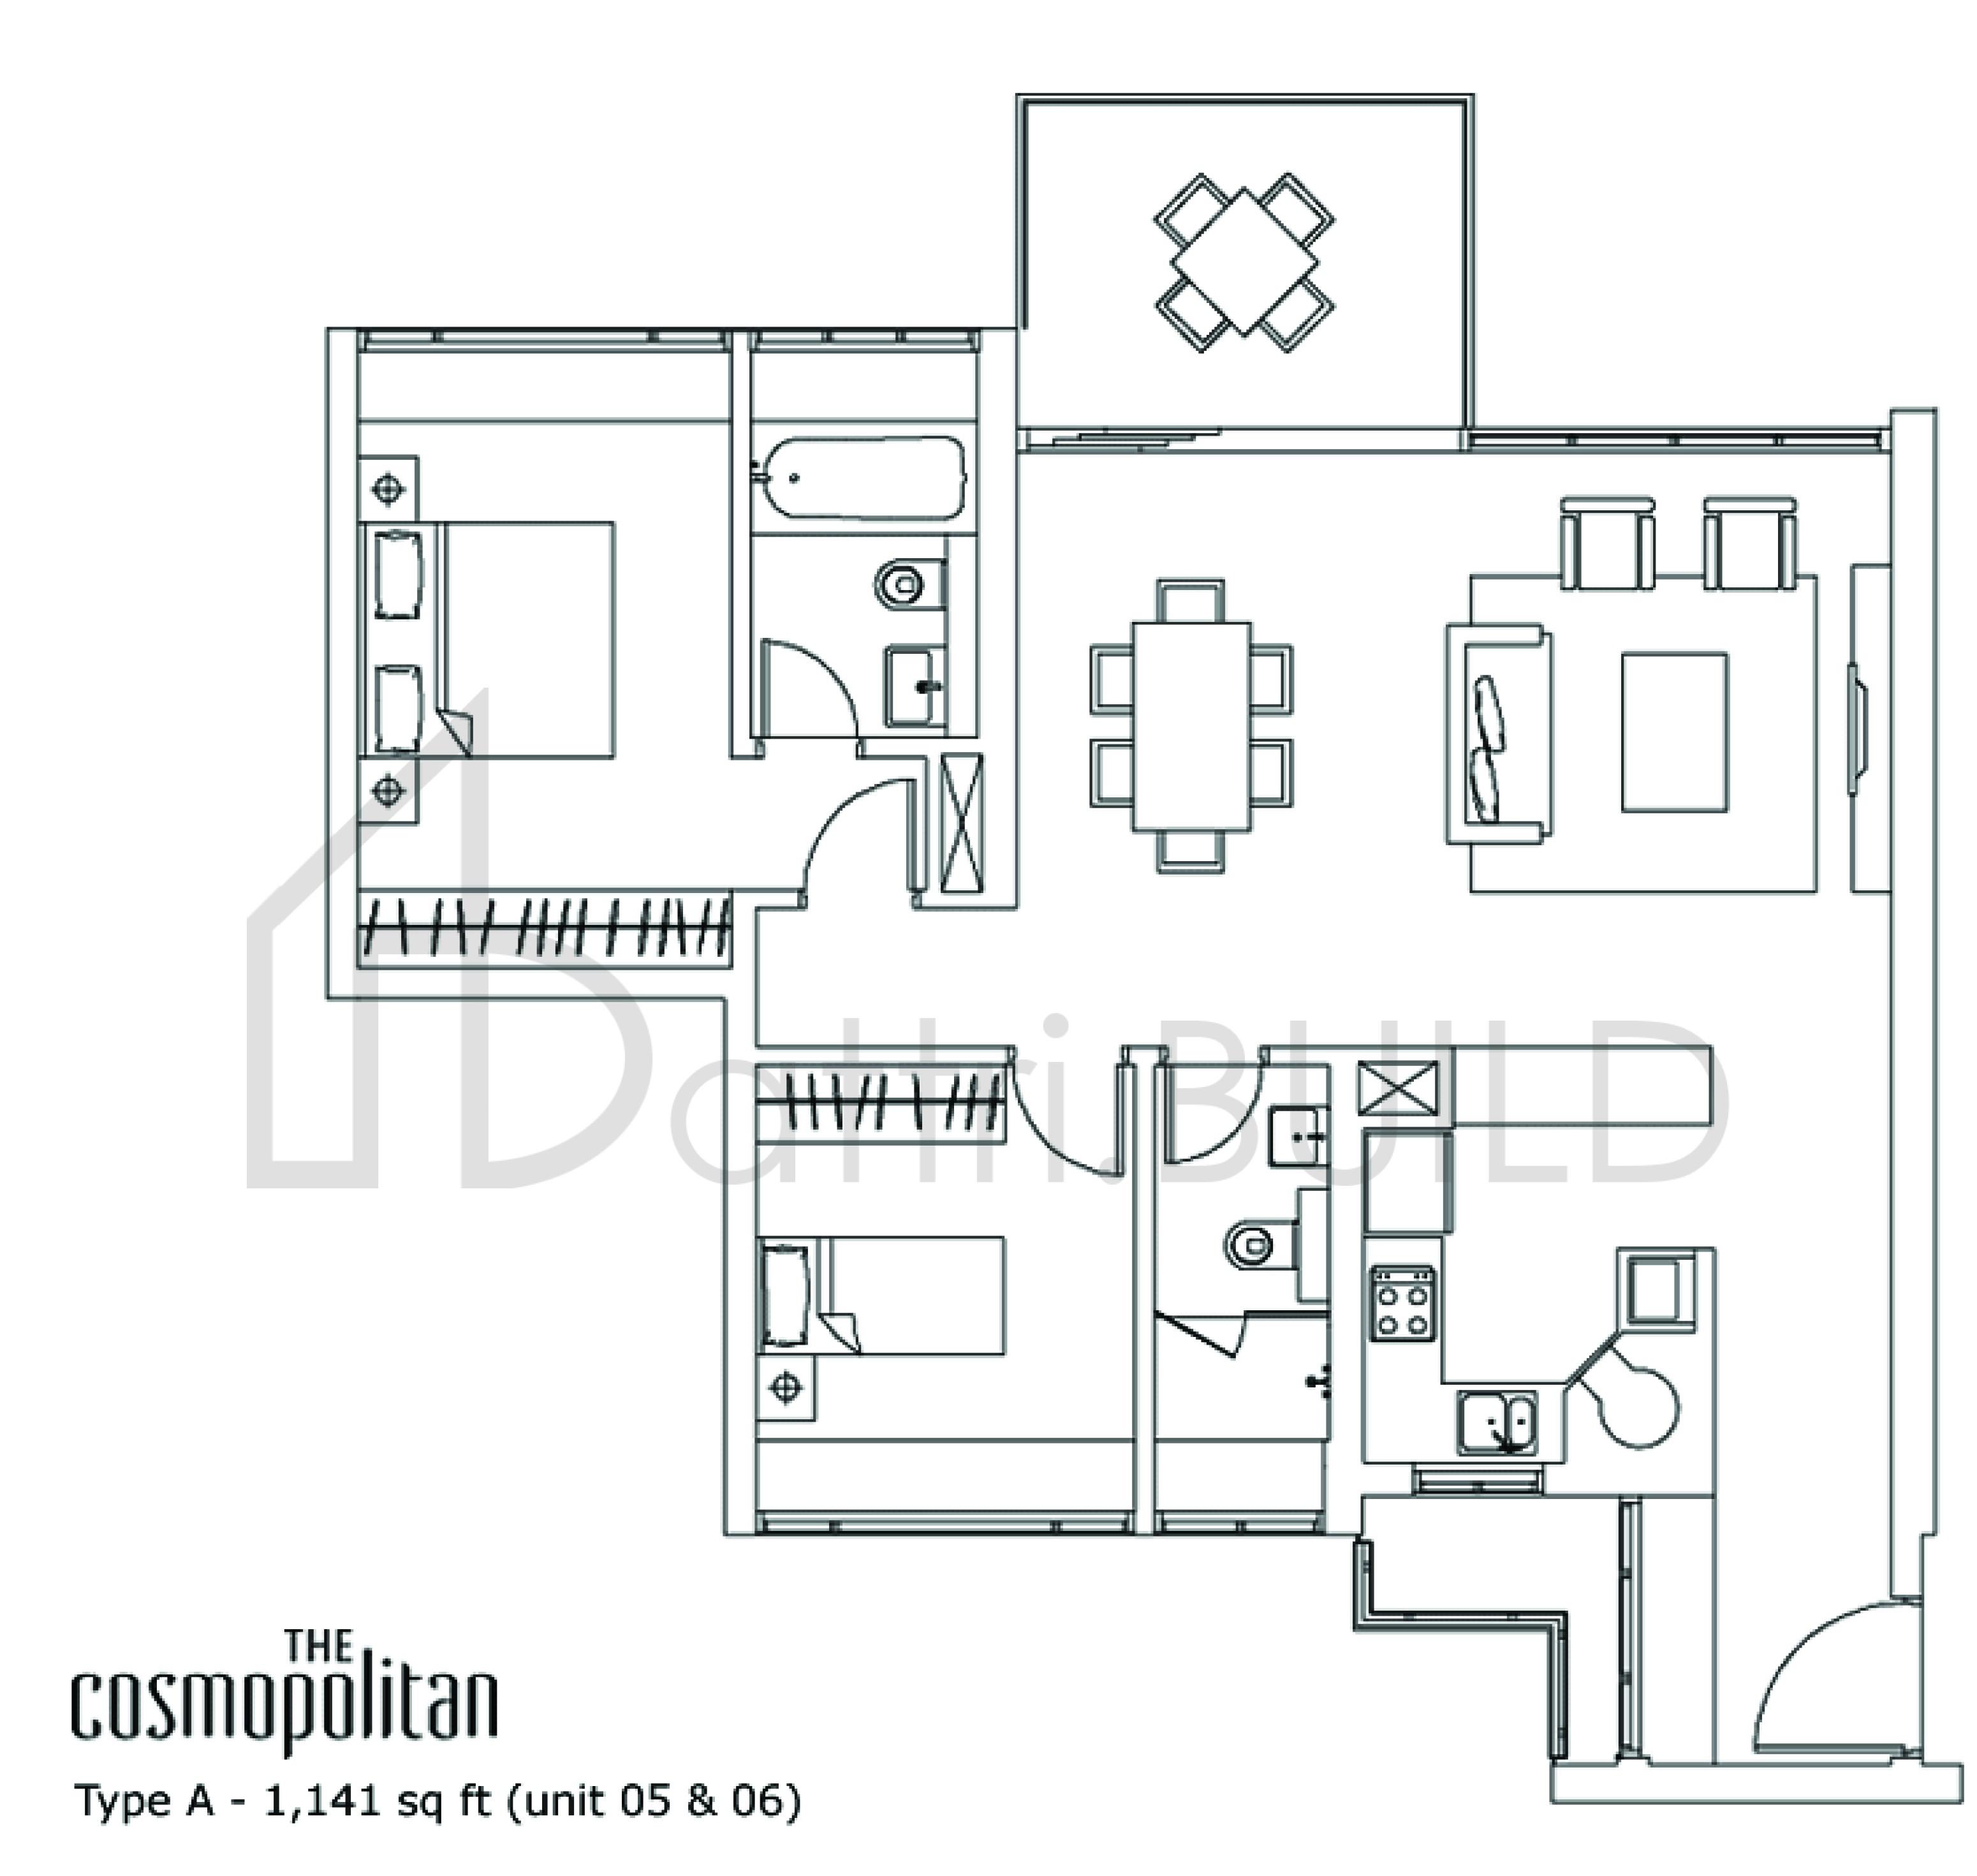 The Cosmopolitan 2 Bedroom Type A